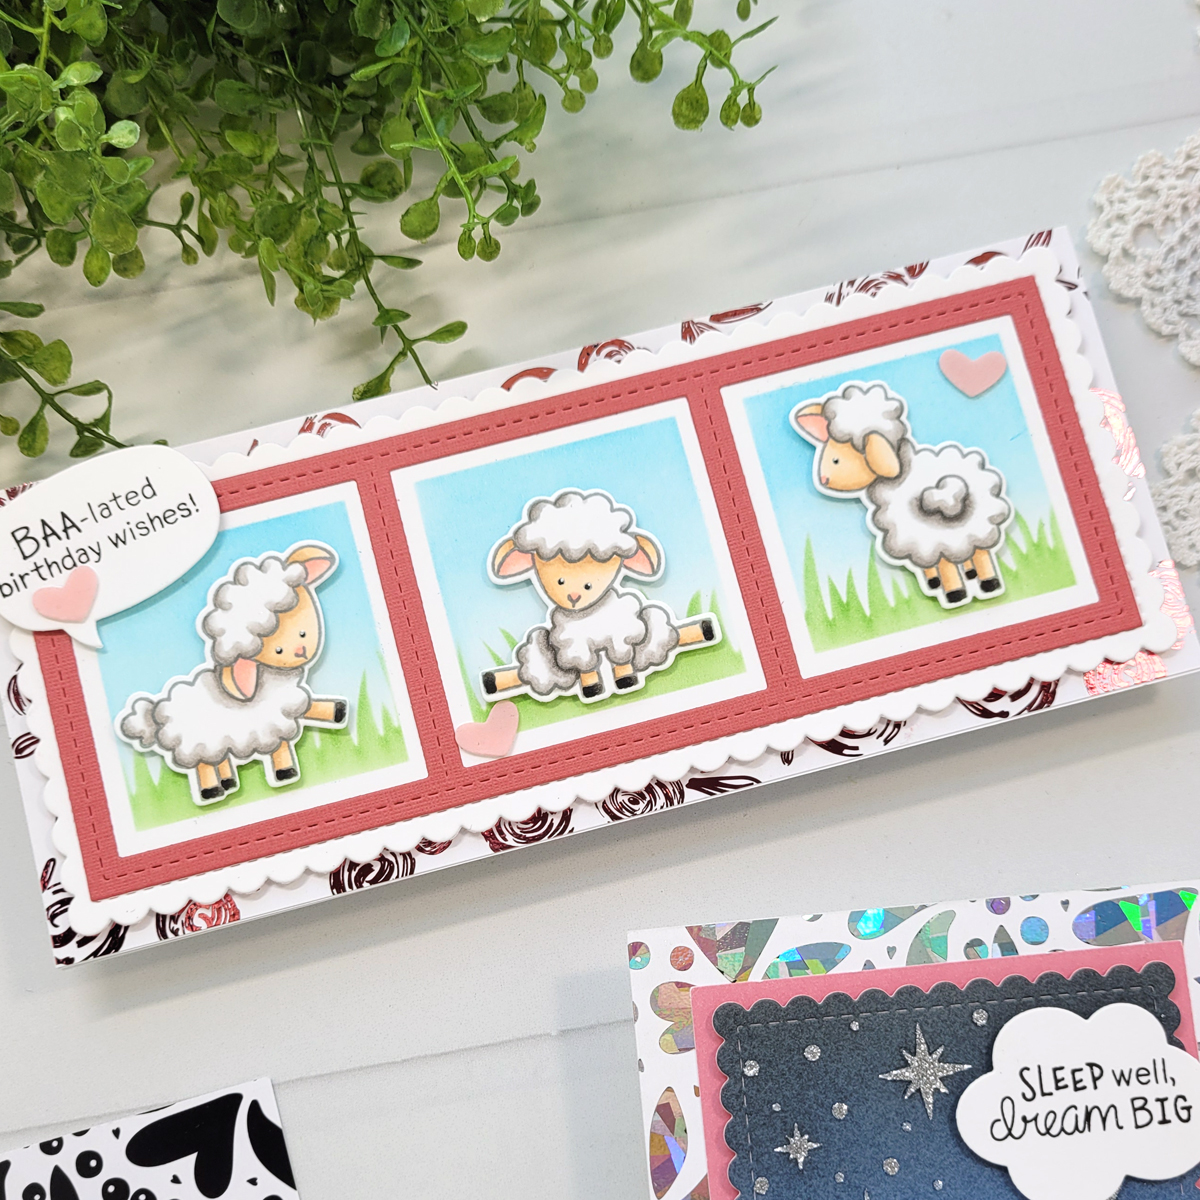 Andrea NND Baa Cards pic 3